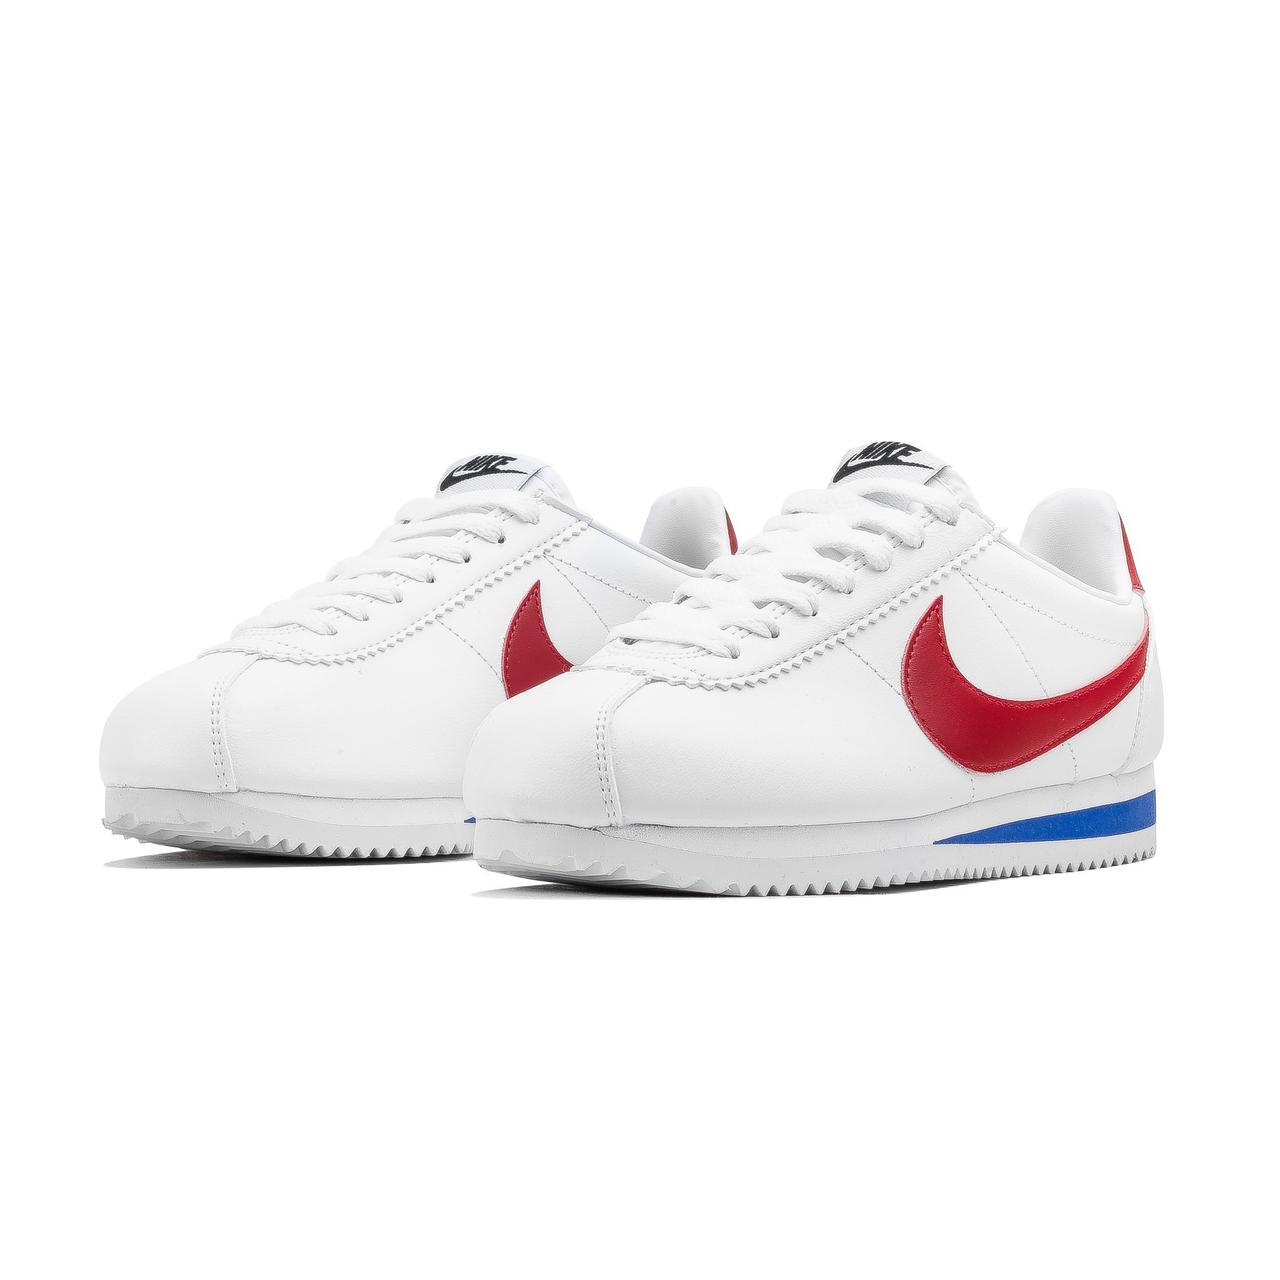 Кроссовки оригинал Nike Cortez Leather 807471 103